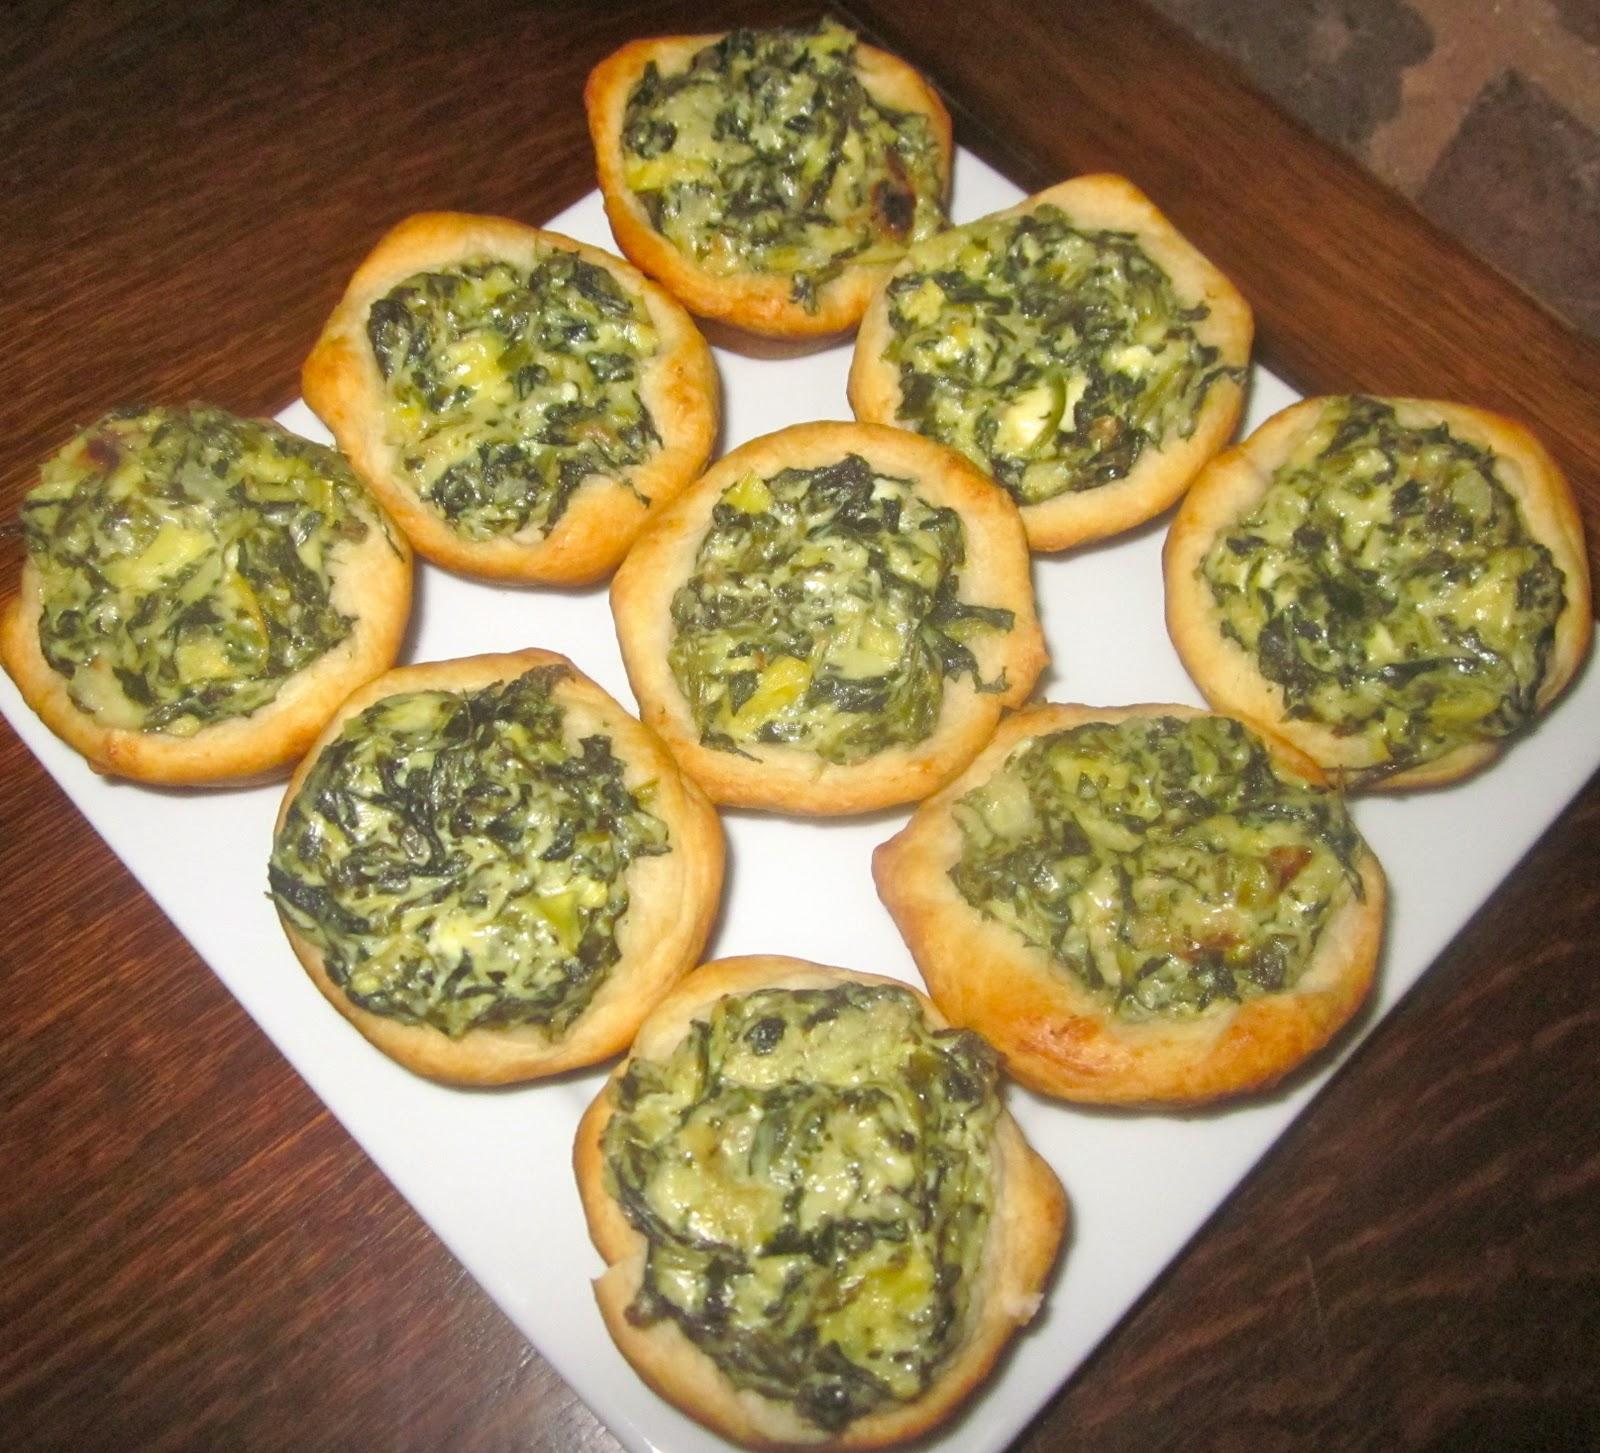 Spinach Artichoke Dip in Bread Bowl Mini Spinach-artichoke Dip